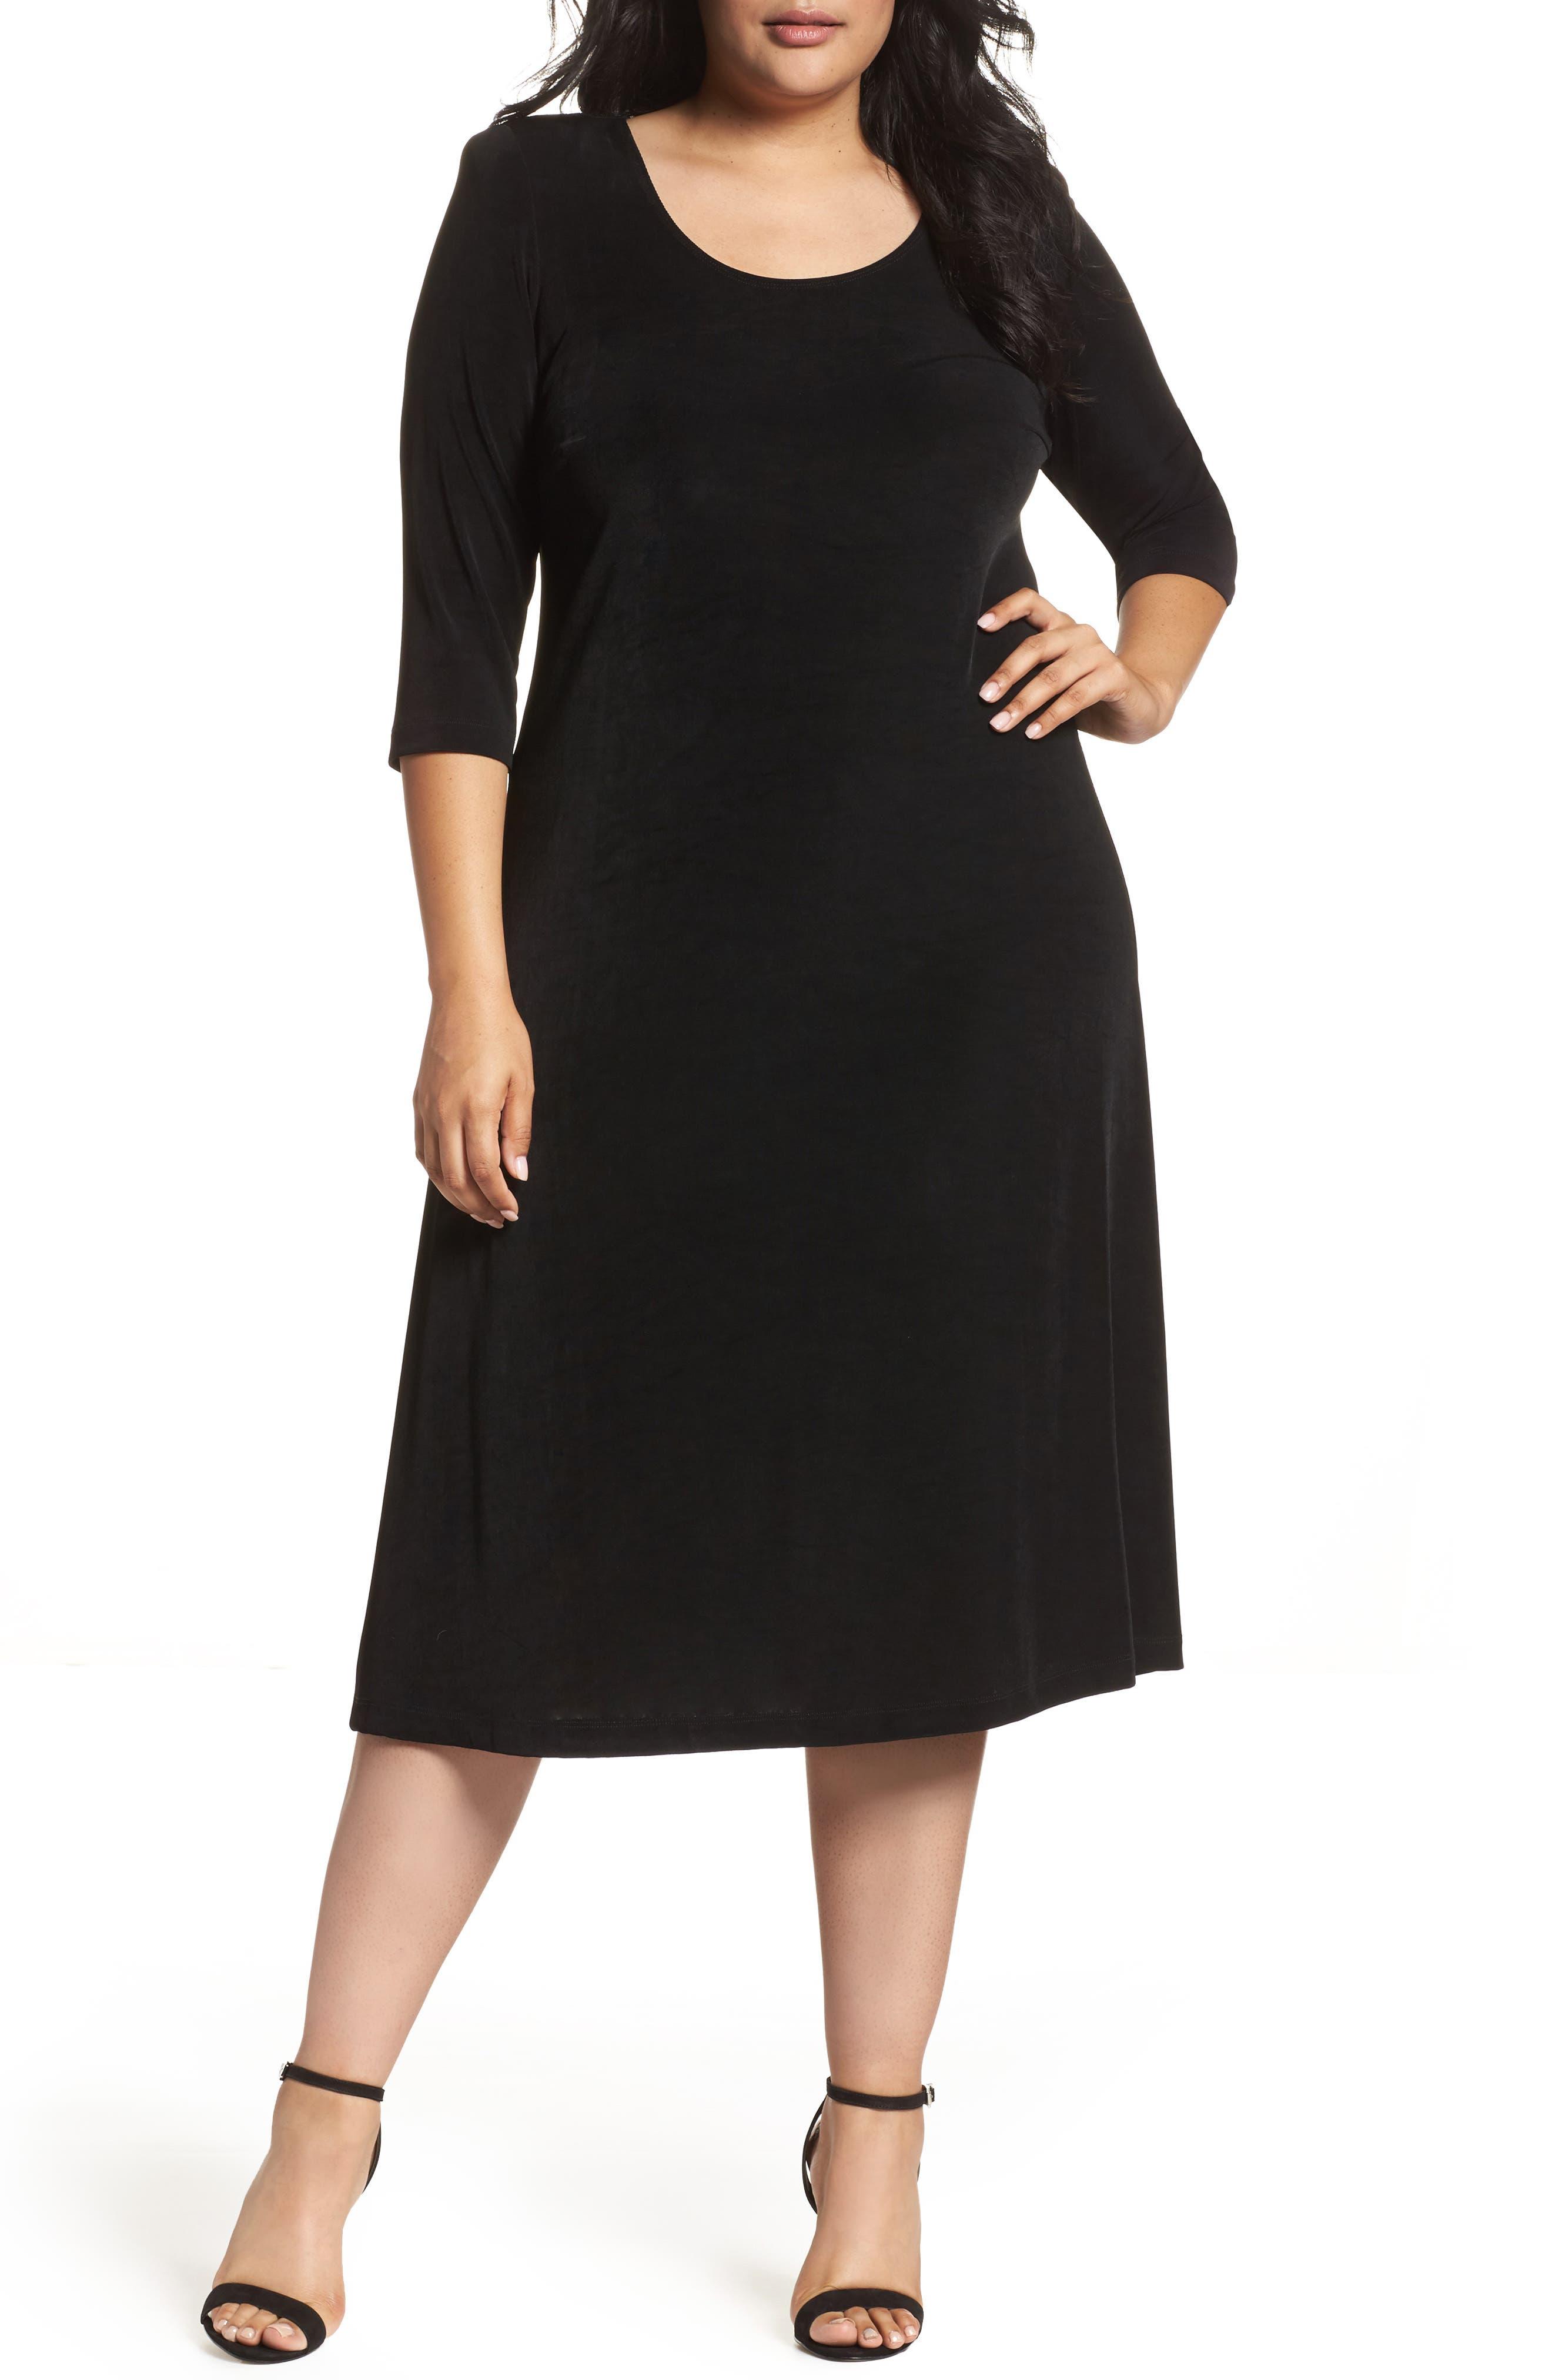 Vikki Vi Three-Quarter Sleeve Stretch Knit A-Line Dress (Plus Size)